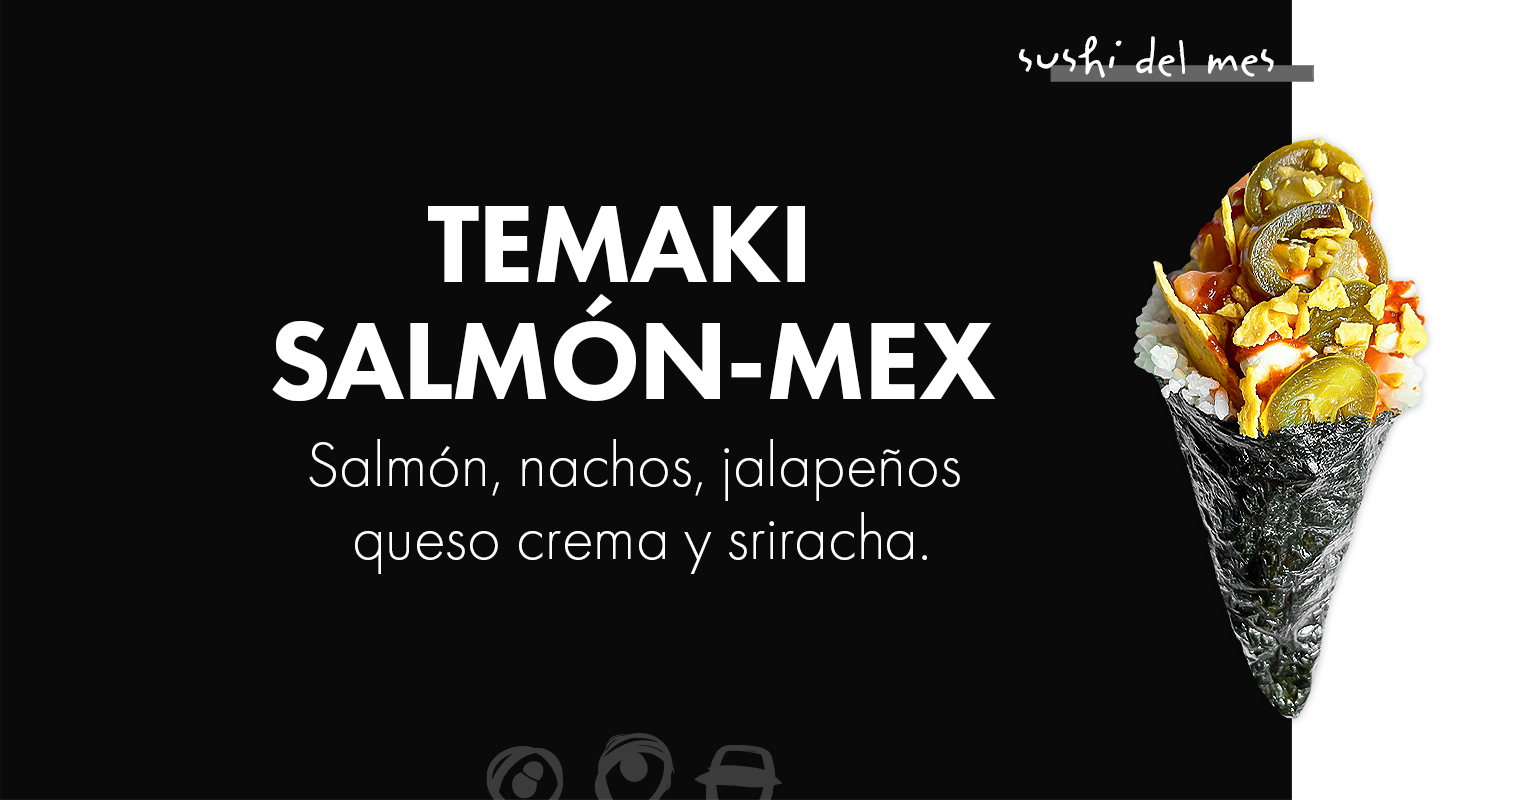 SUSHI DEL MES: TEMAKI SALMÓN-MEX